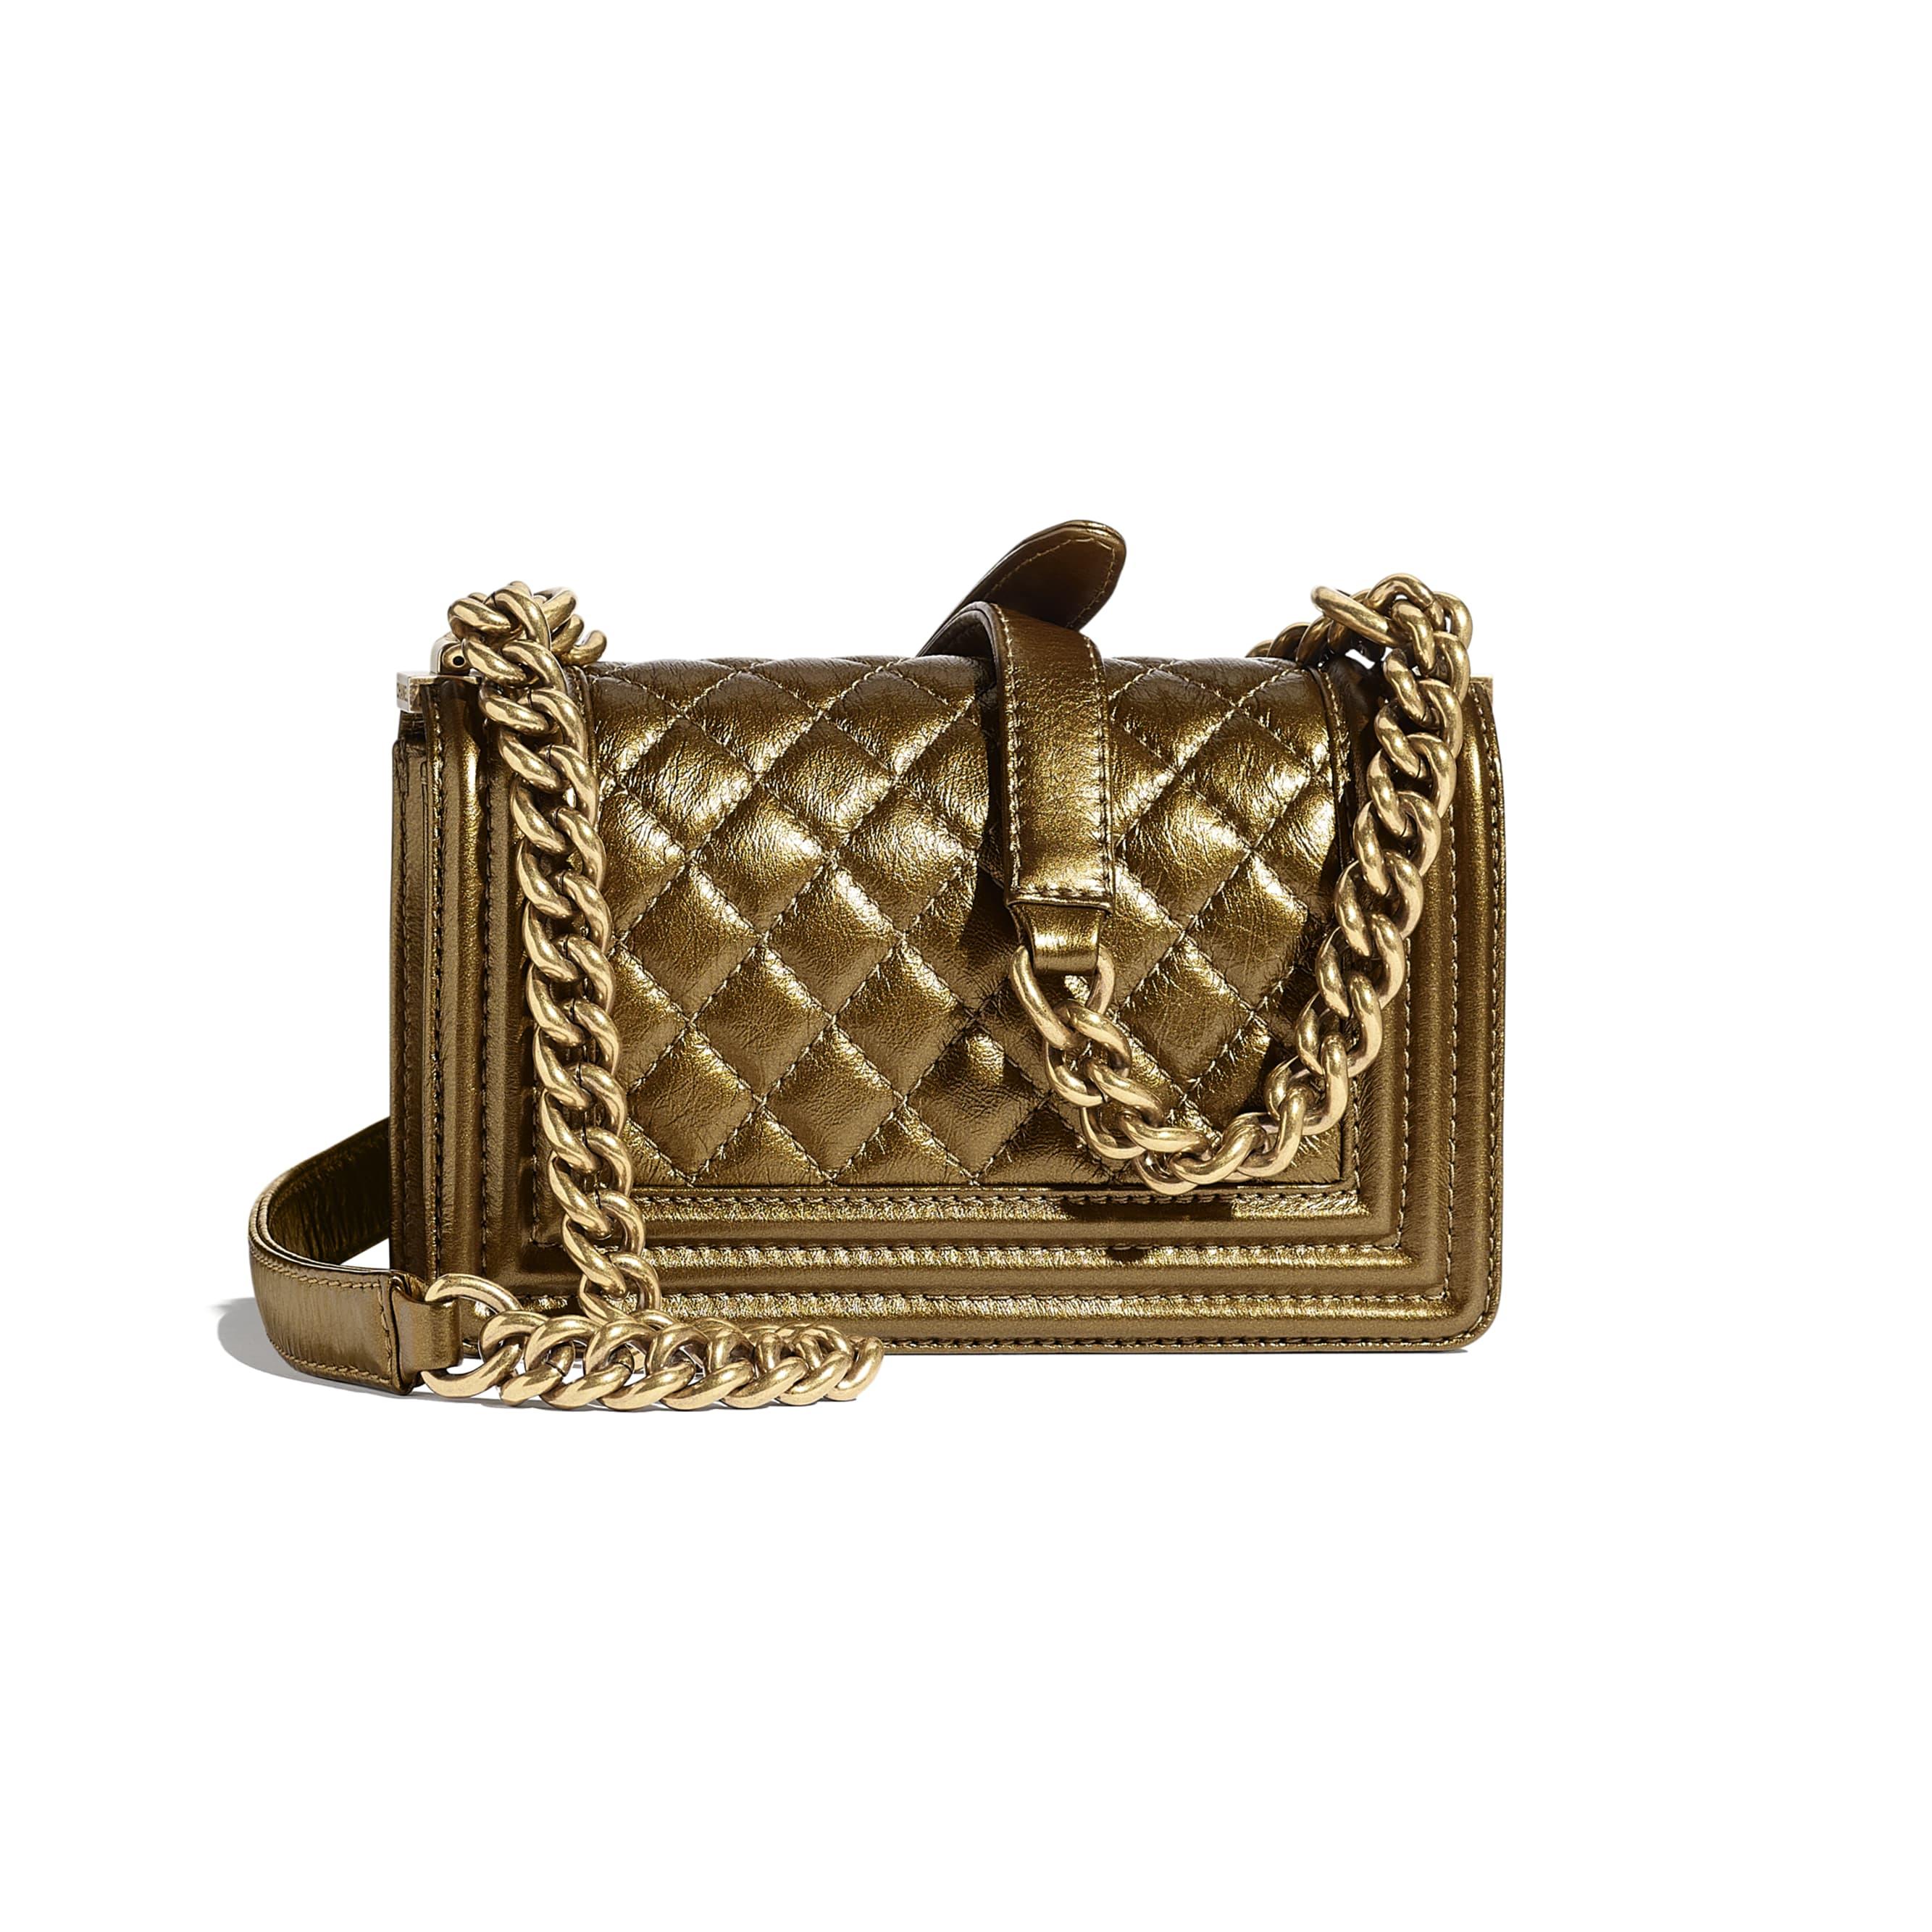 Small BOY CHANEL Handbag - Gold - Metallic Calfskin, Enamel & Gold-Tone Metal - CHANEL - Alternative view - see standard sized version